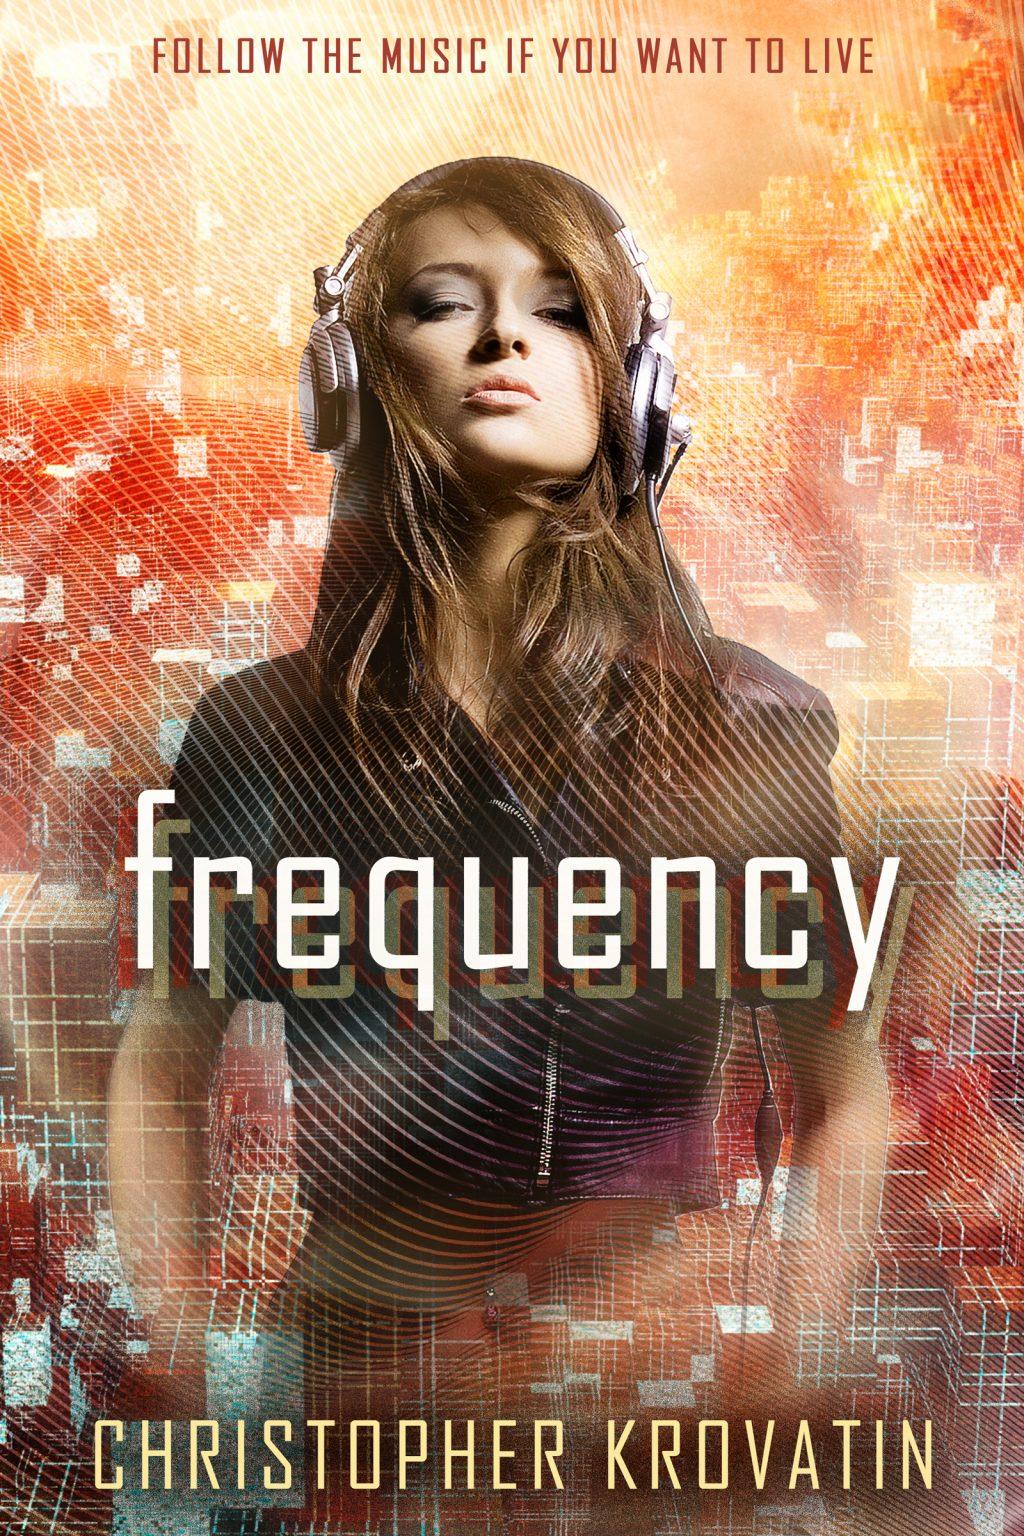 Frequency byChristopherKrovatin